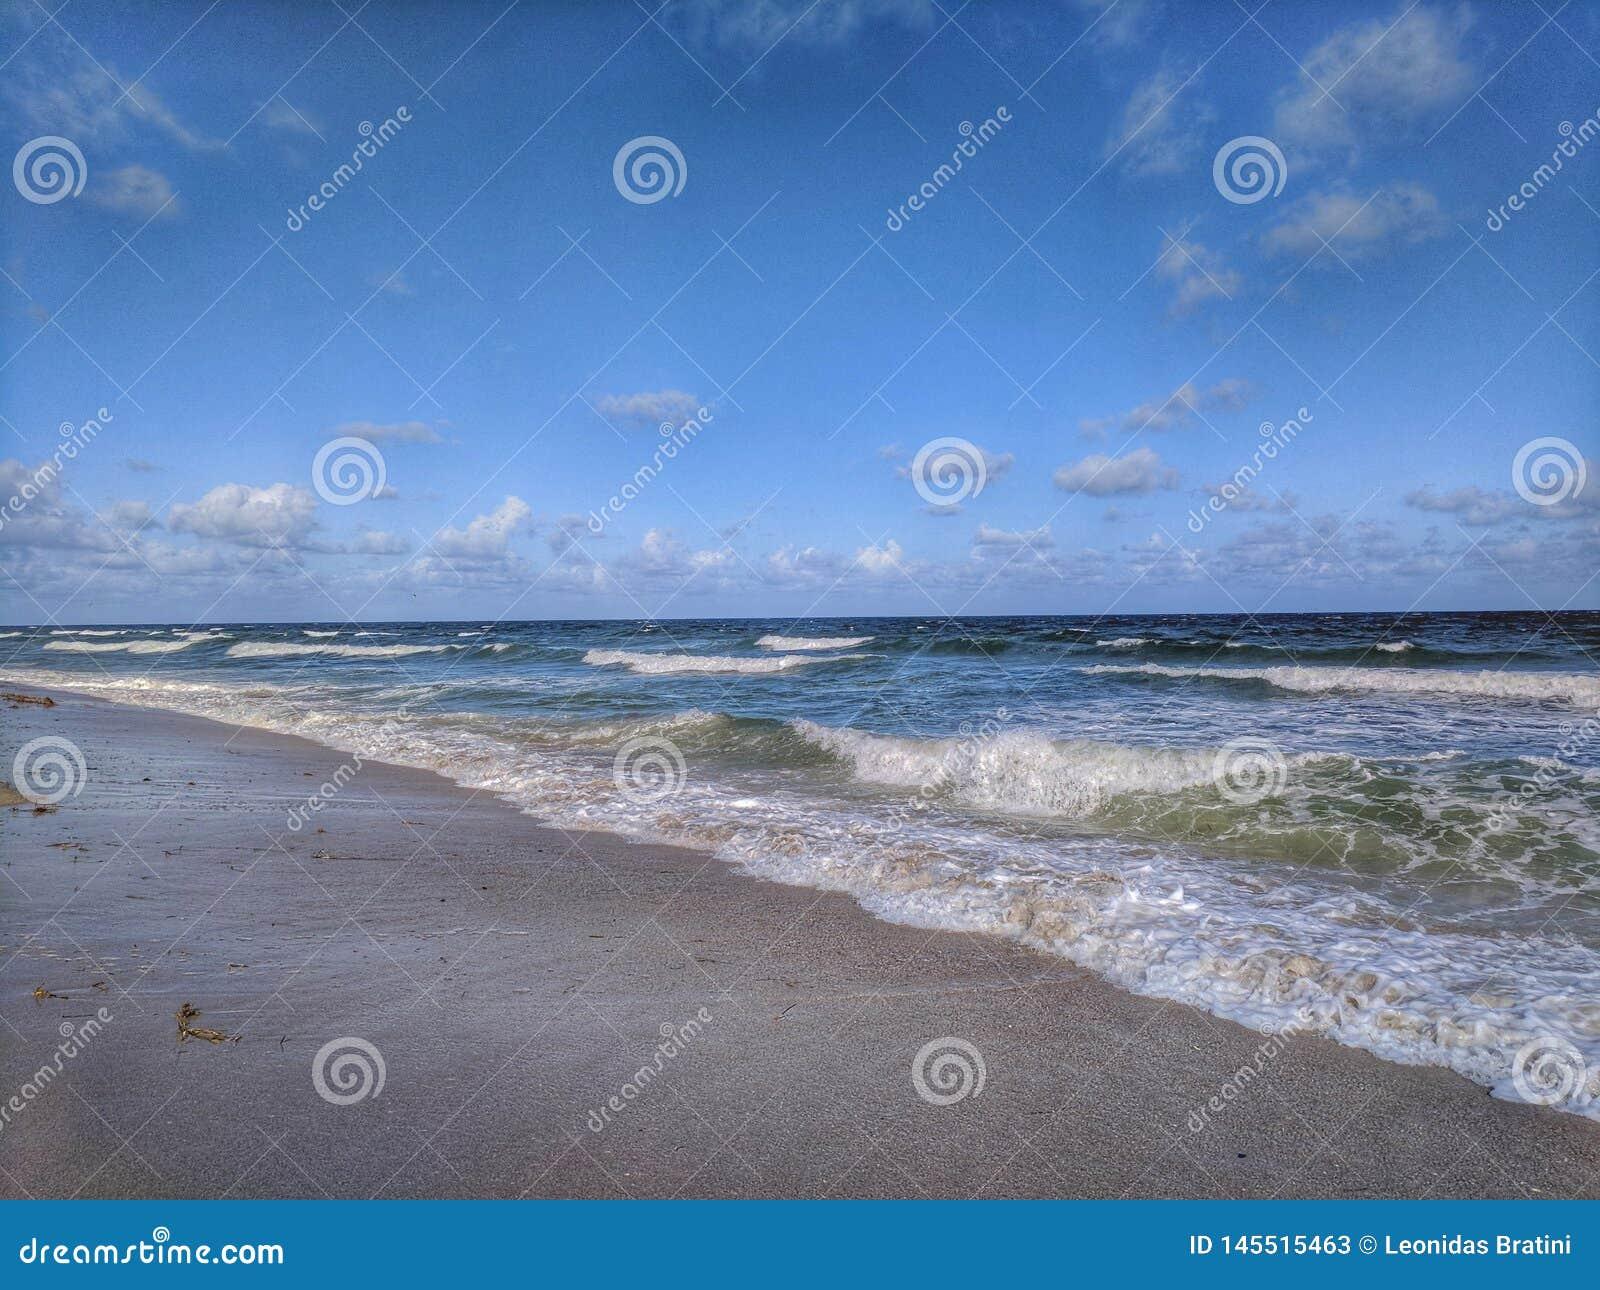 Após ter apreciado a ressaca na praia